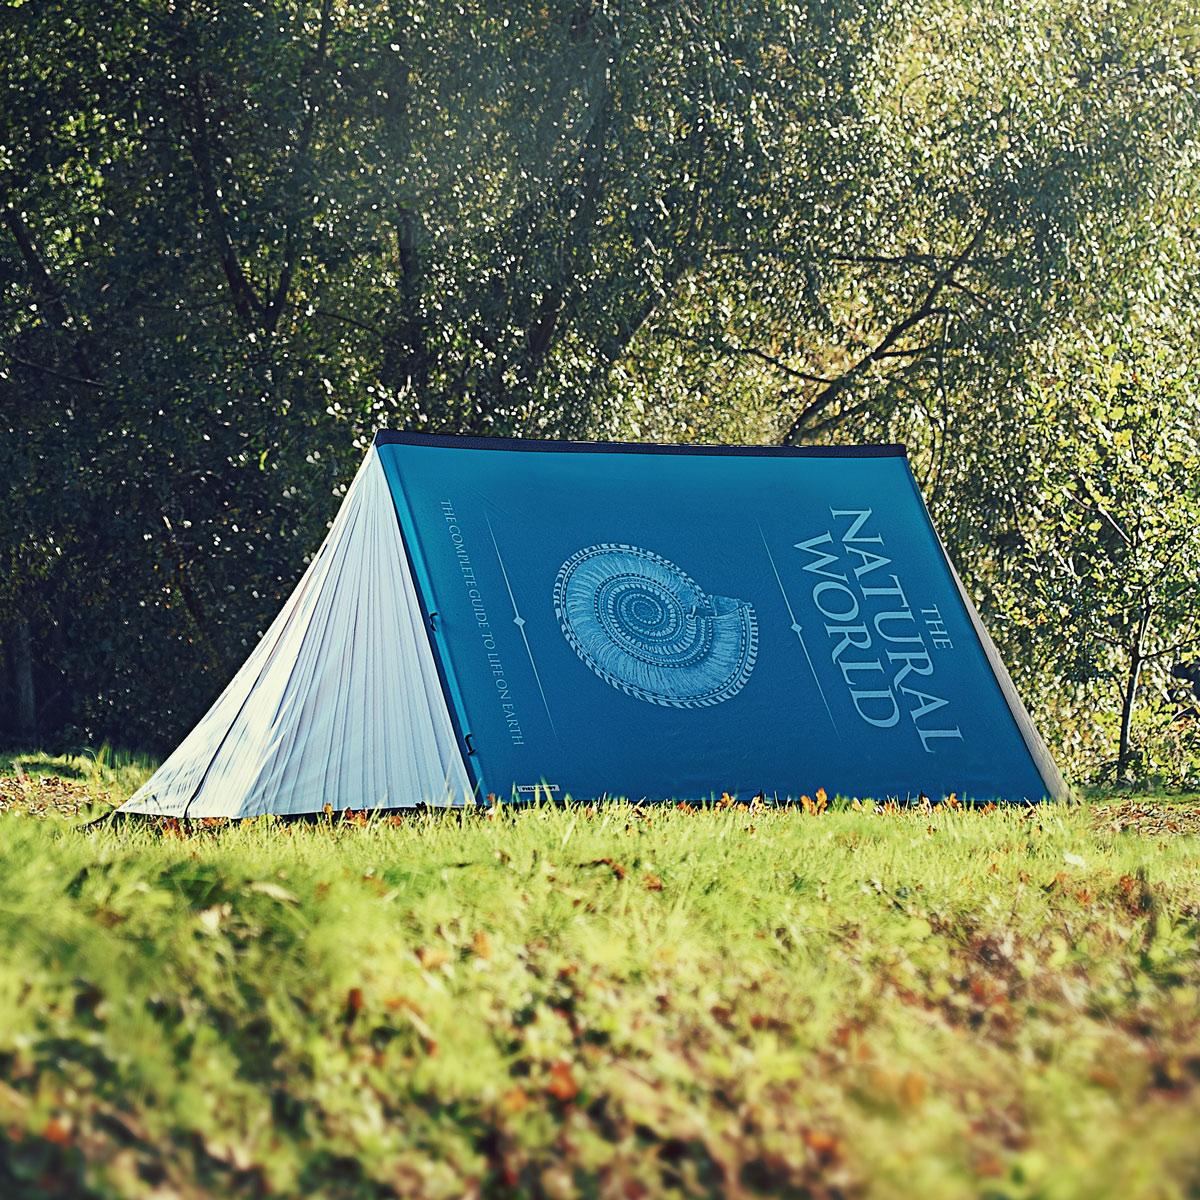 creative designed tents Book tent